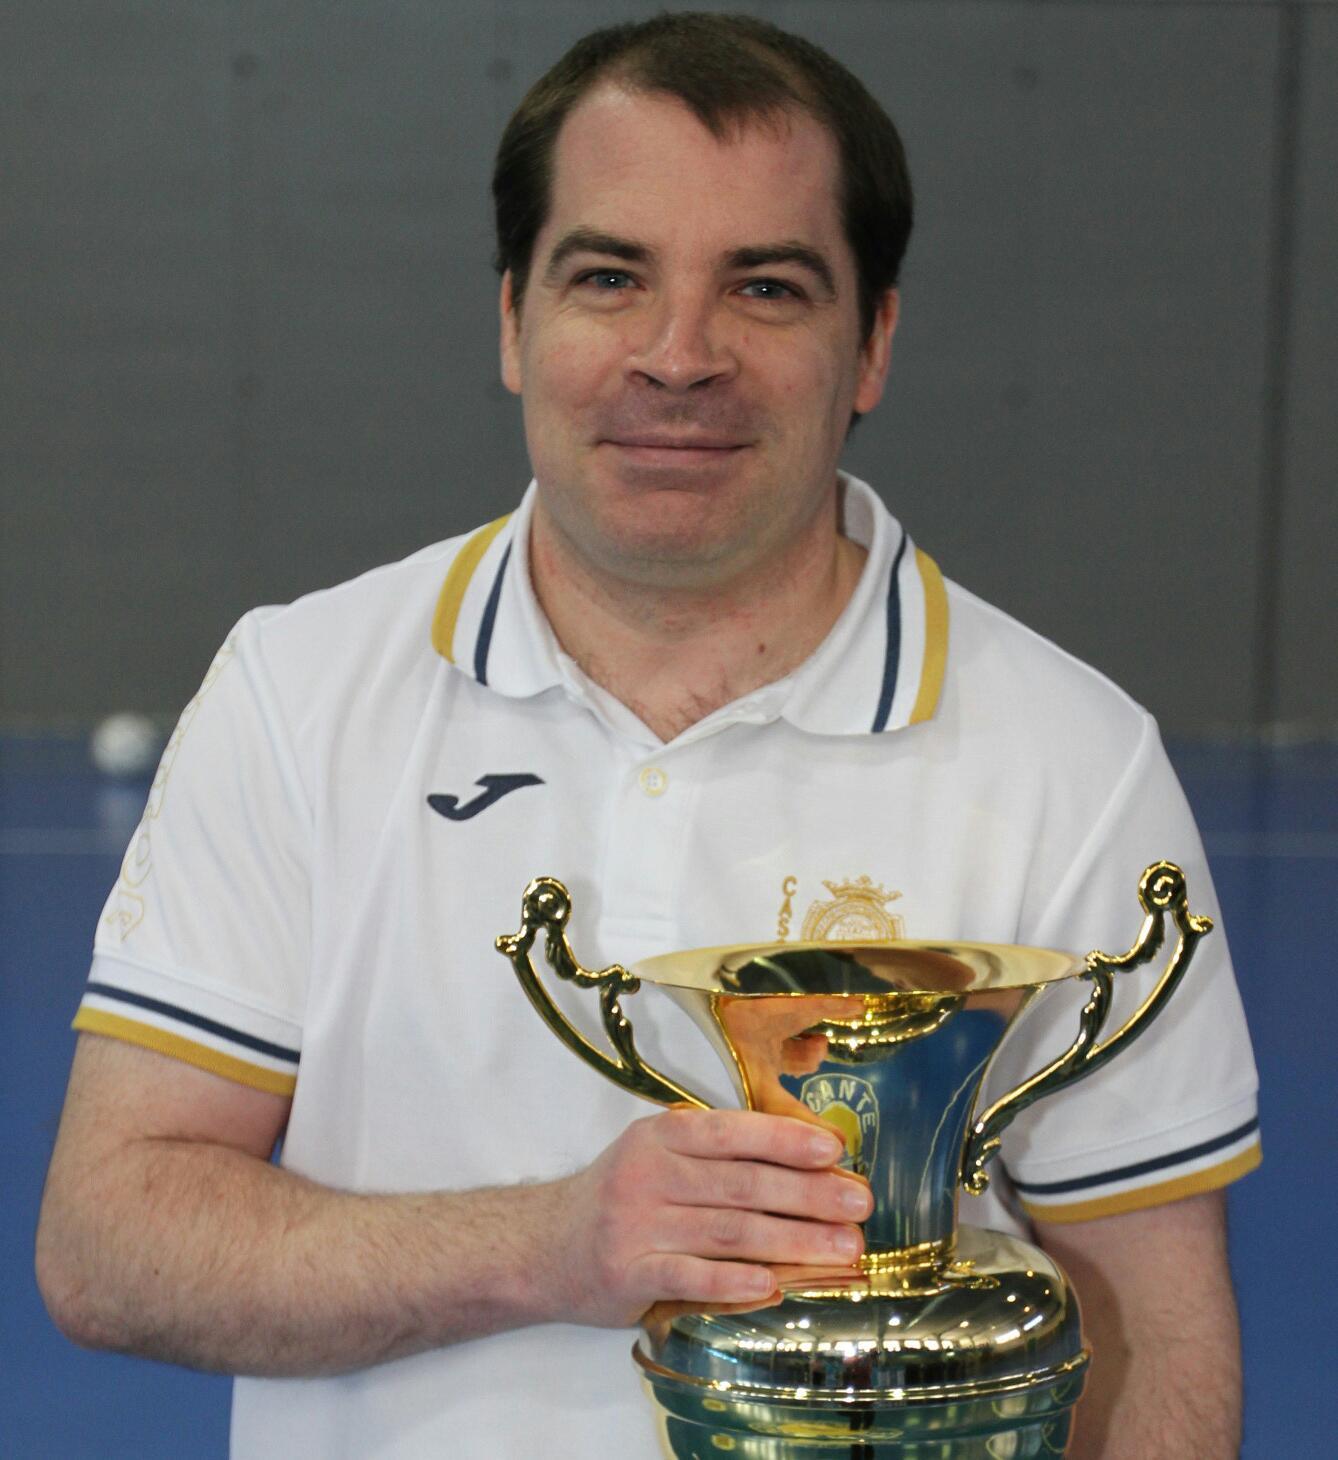 Álvaro Abad